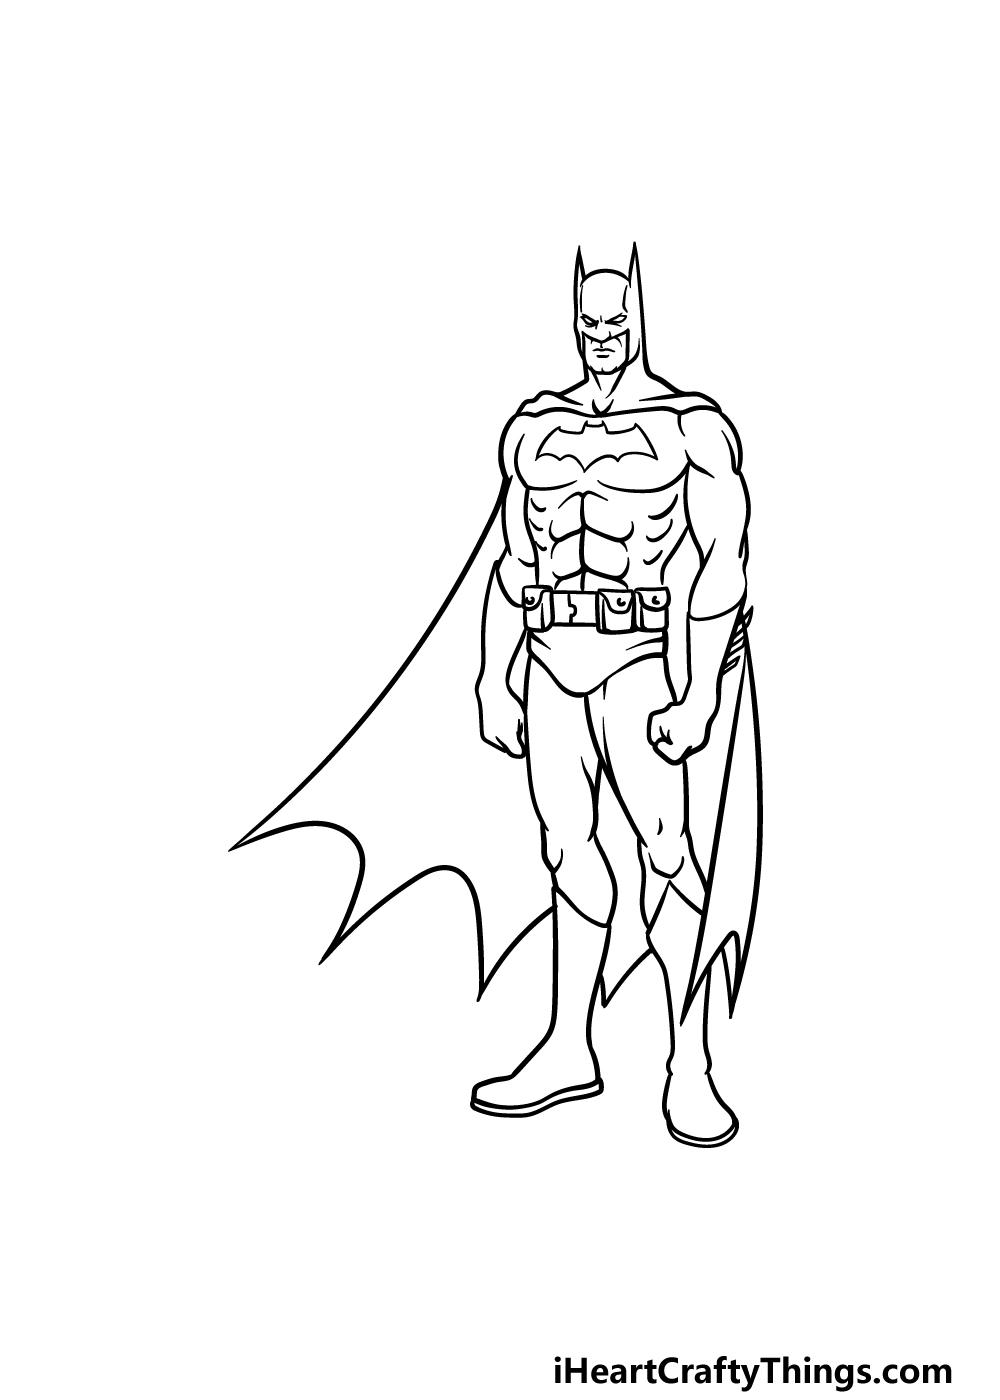 drawing Batman step 5